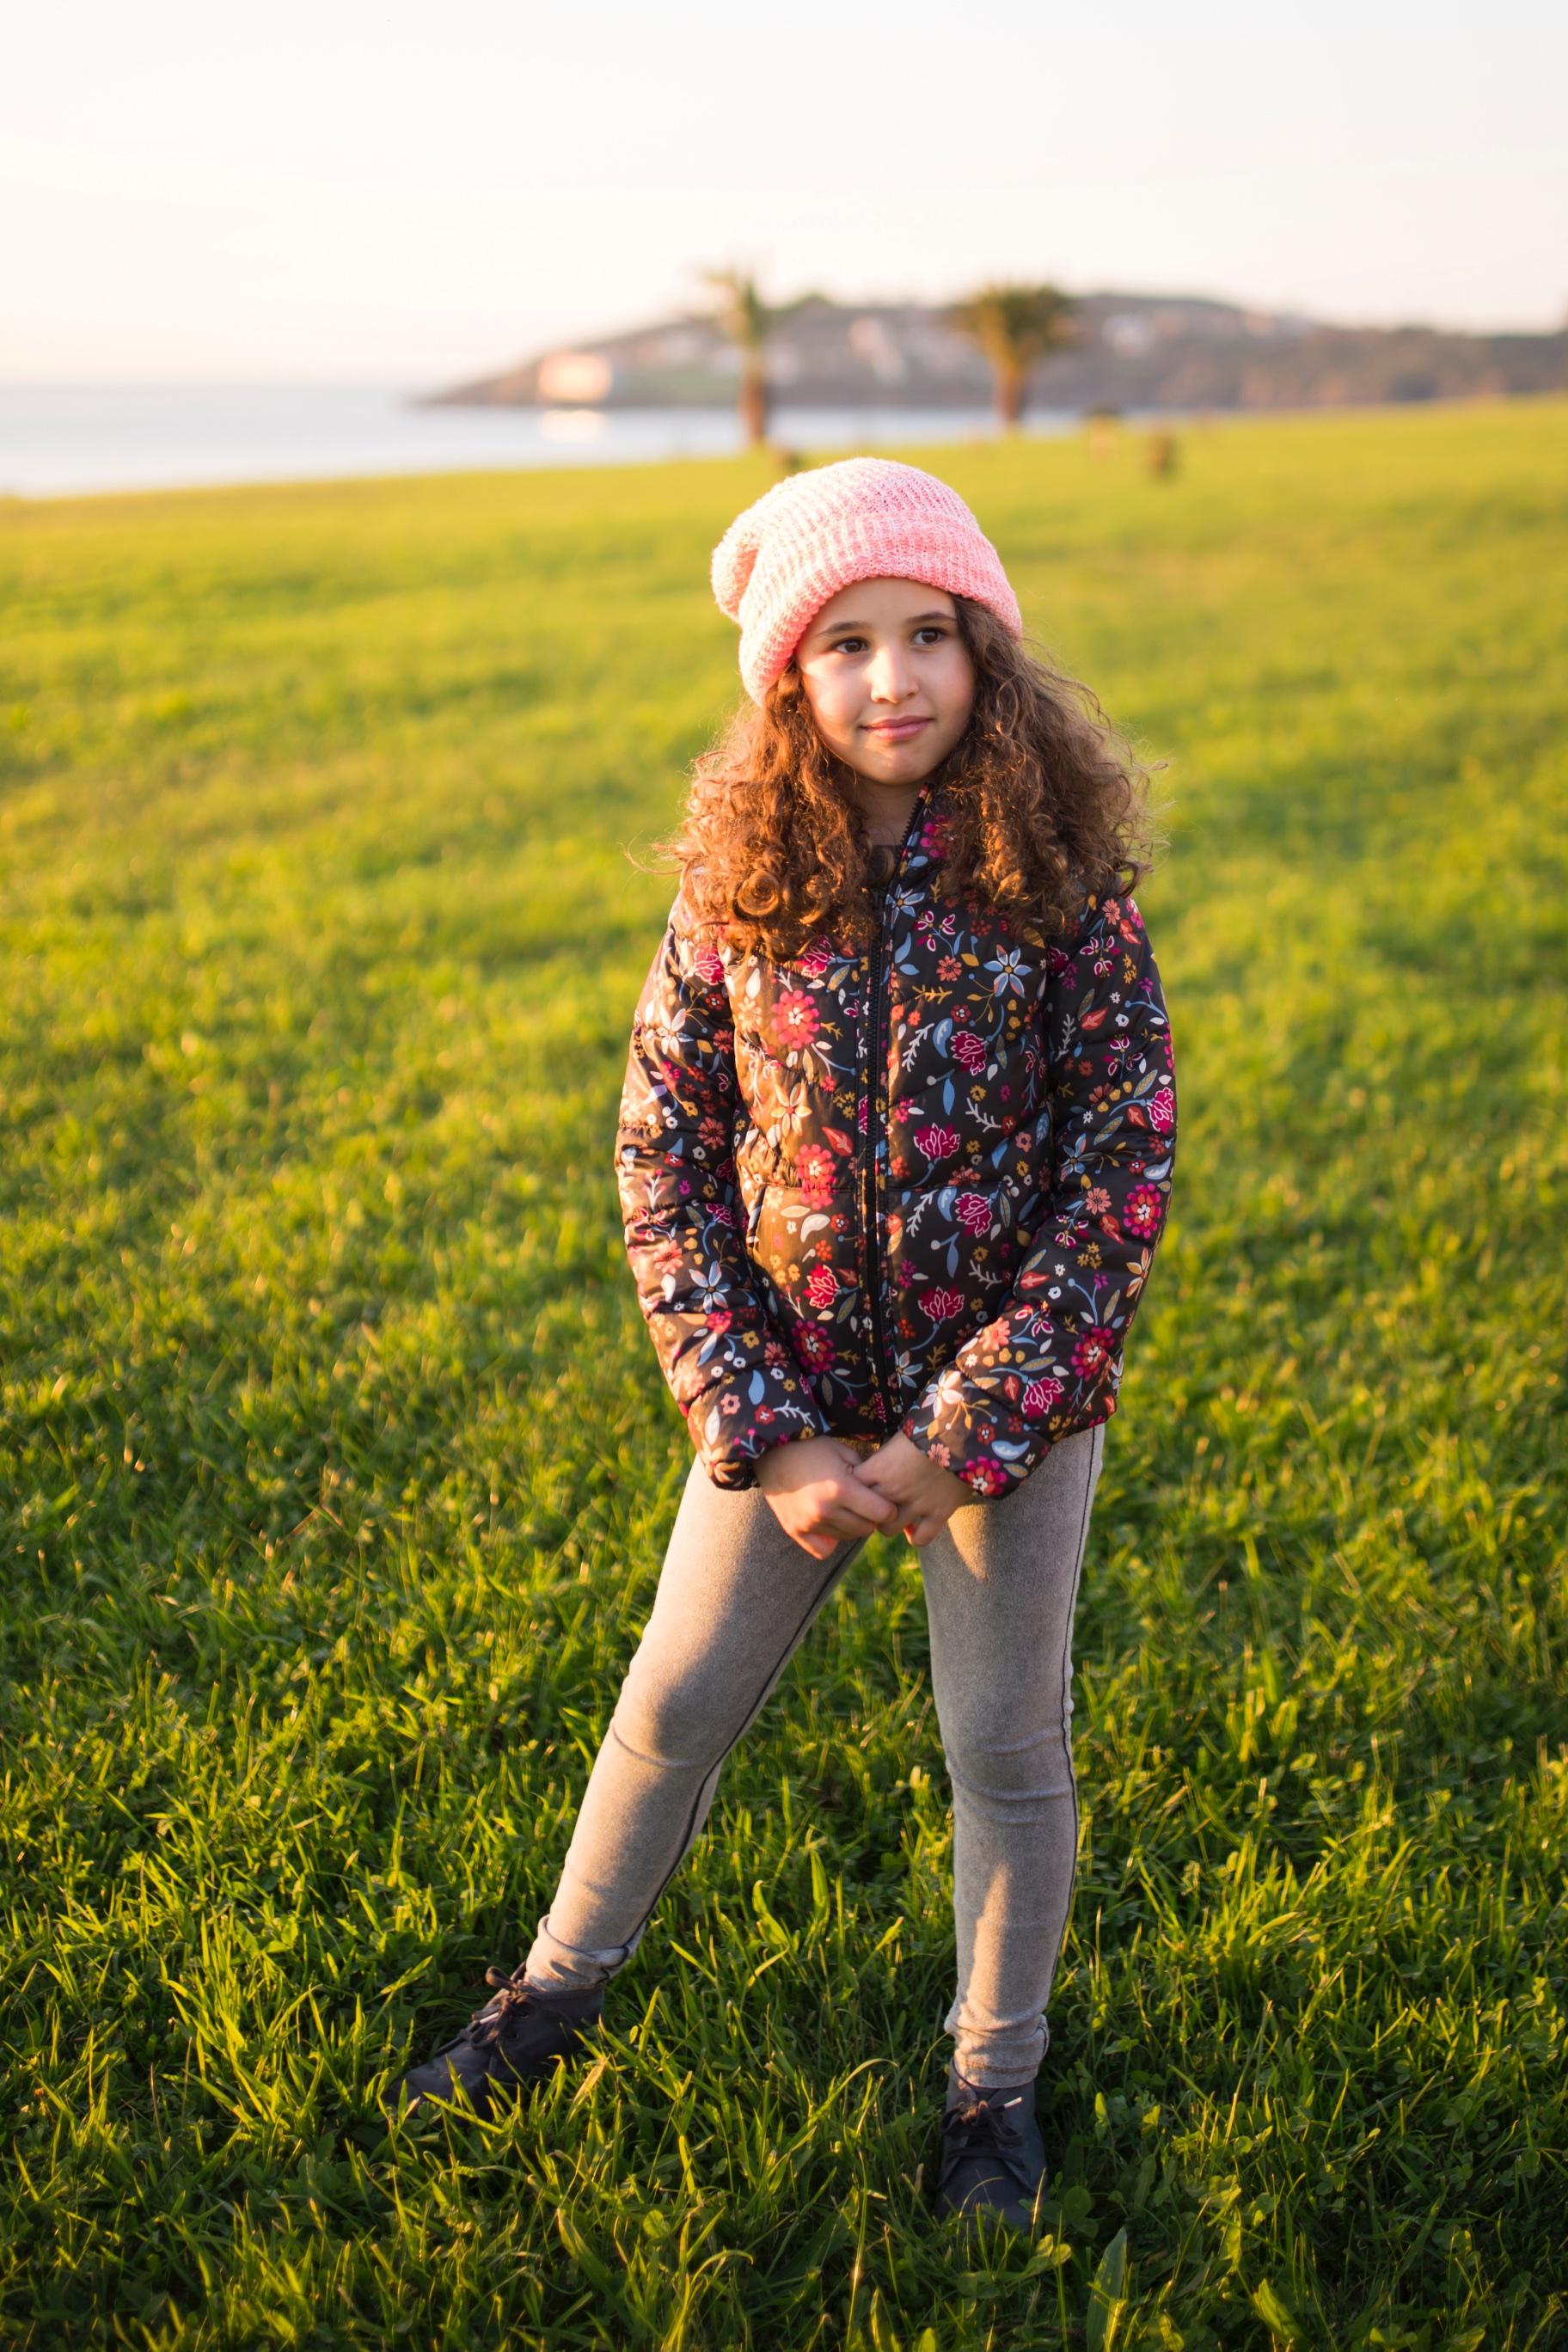 kids-style-descalzaporelparque-mango kids-niños-zara kids-streetstyle-moda infantil